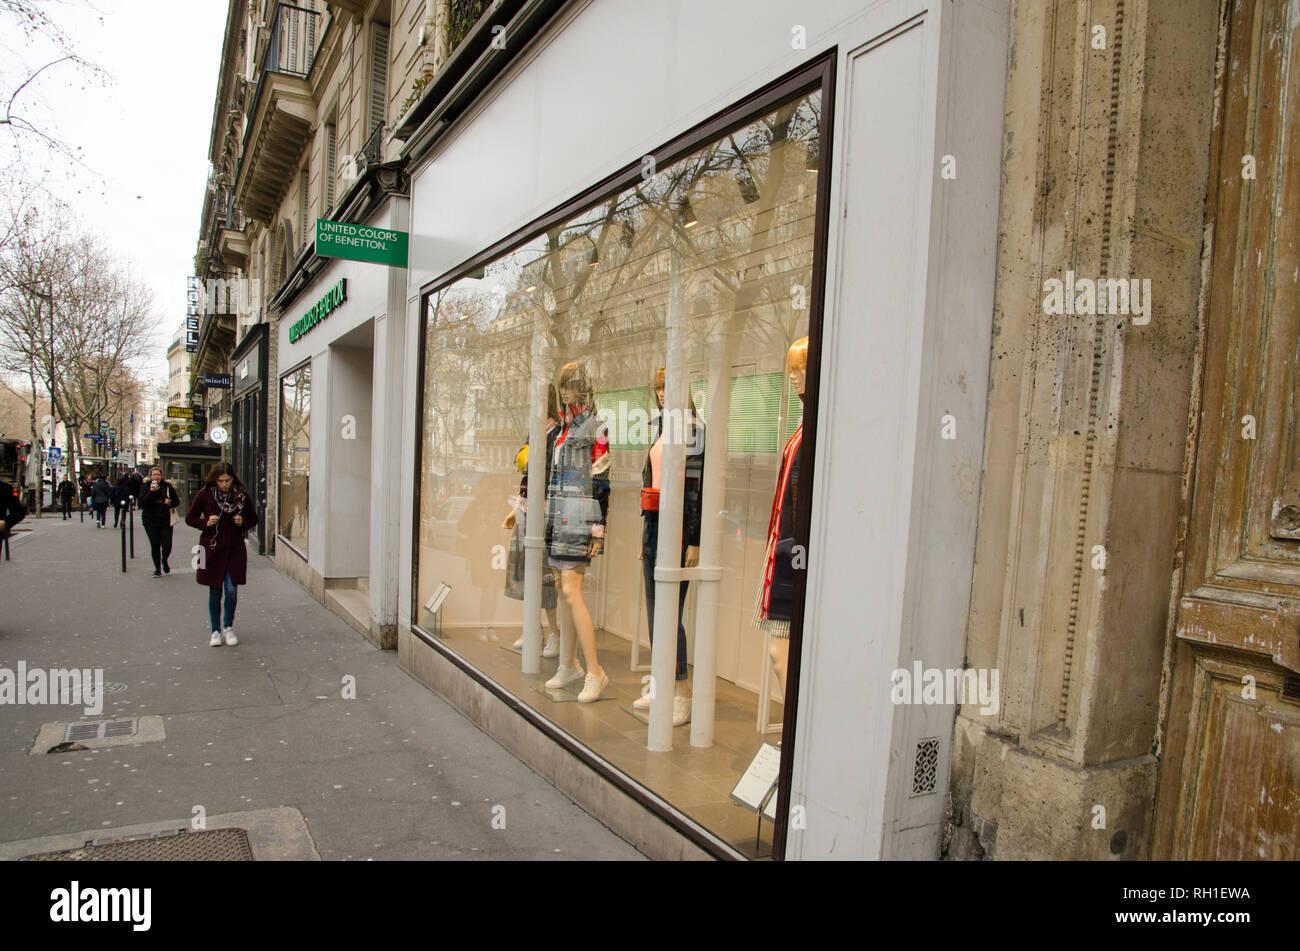 United Colors of Benetton windows shop in Boulevard Saint-Michel. Paris, January 28th, 2019 - Stock Image